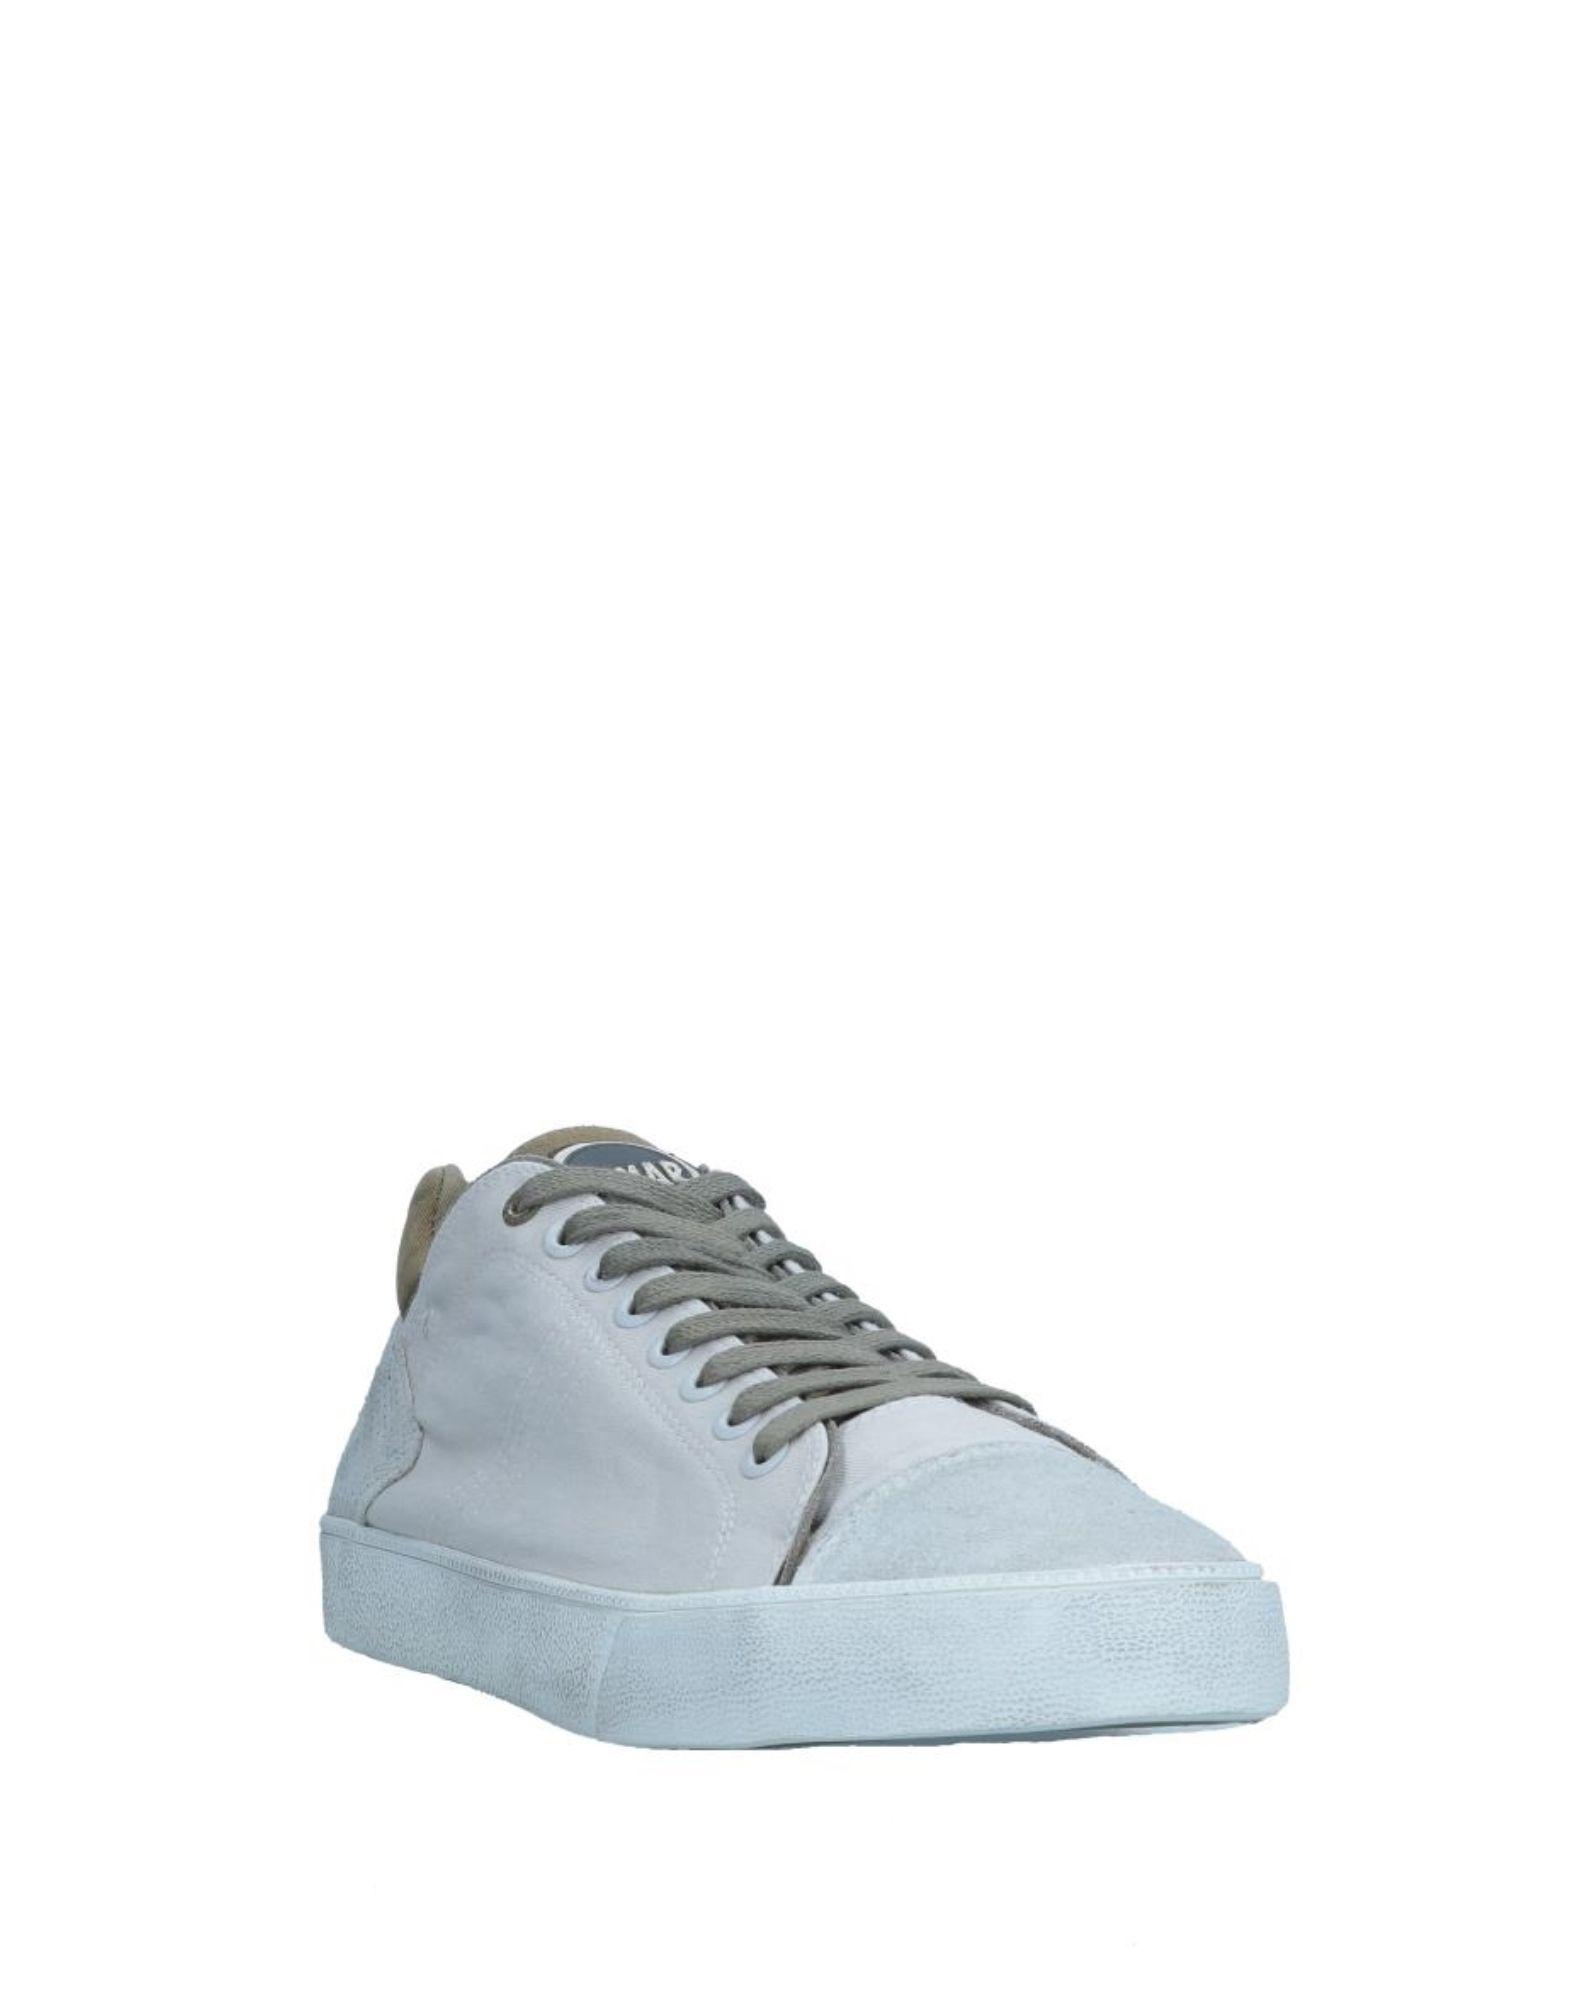 11546443KI Colmar Sneakers Herren  11546443KI  ac0f4d